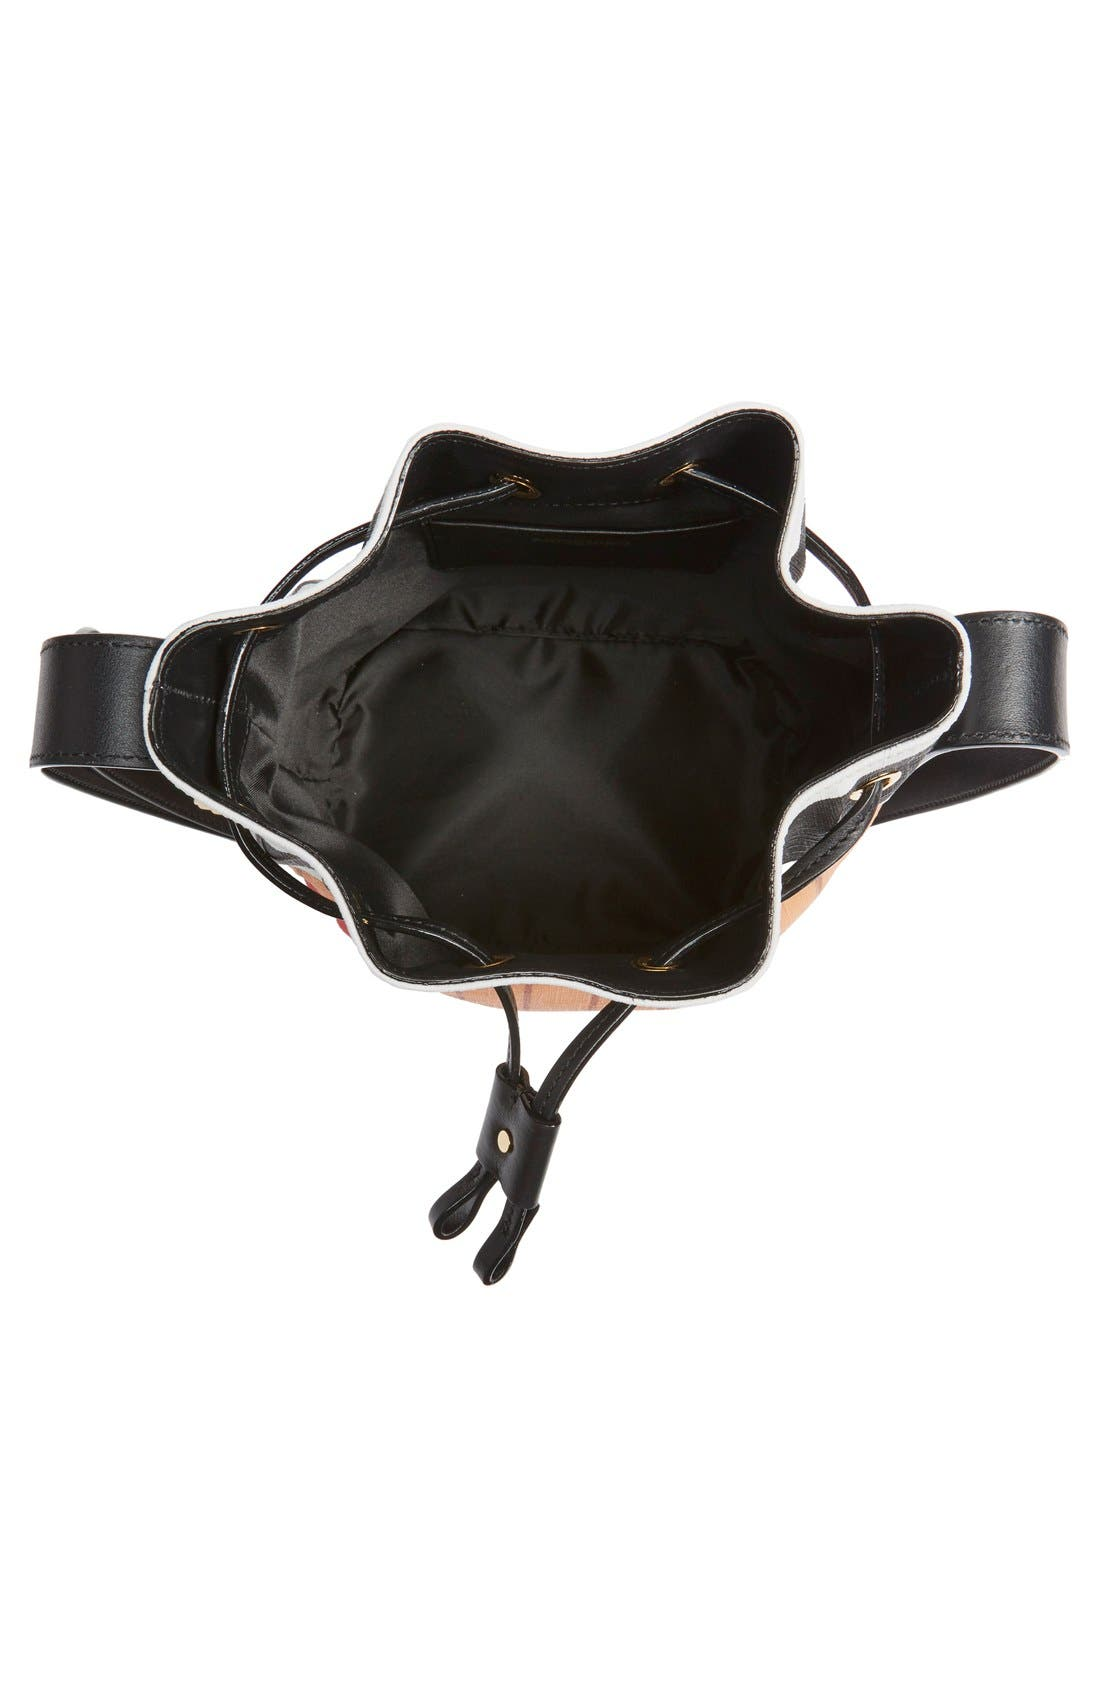 'It's Lit Matchbook' Bucket Bag,                             Alternate thumbnail 4, color,                             100